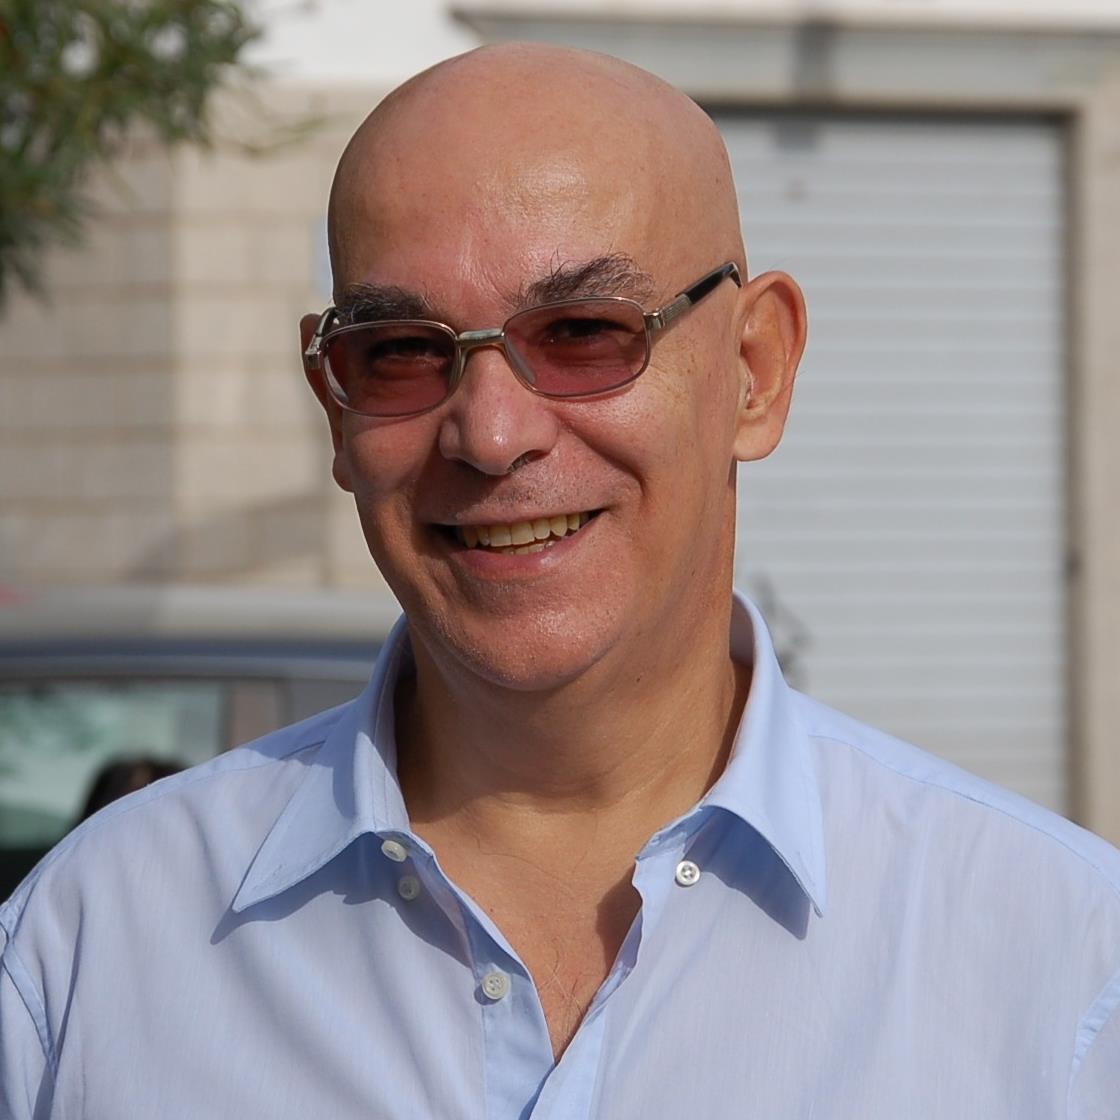 Giuseppe_Maxia.jpg